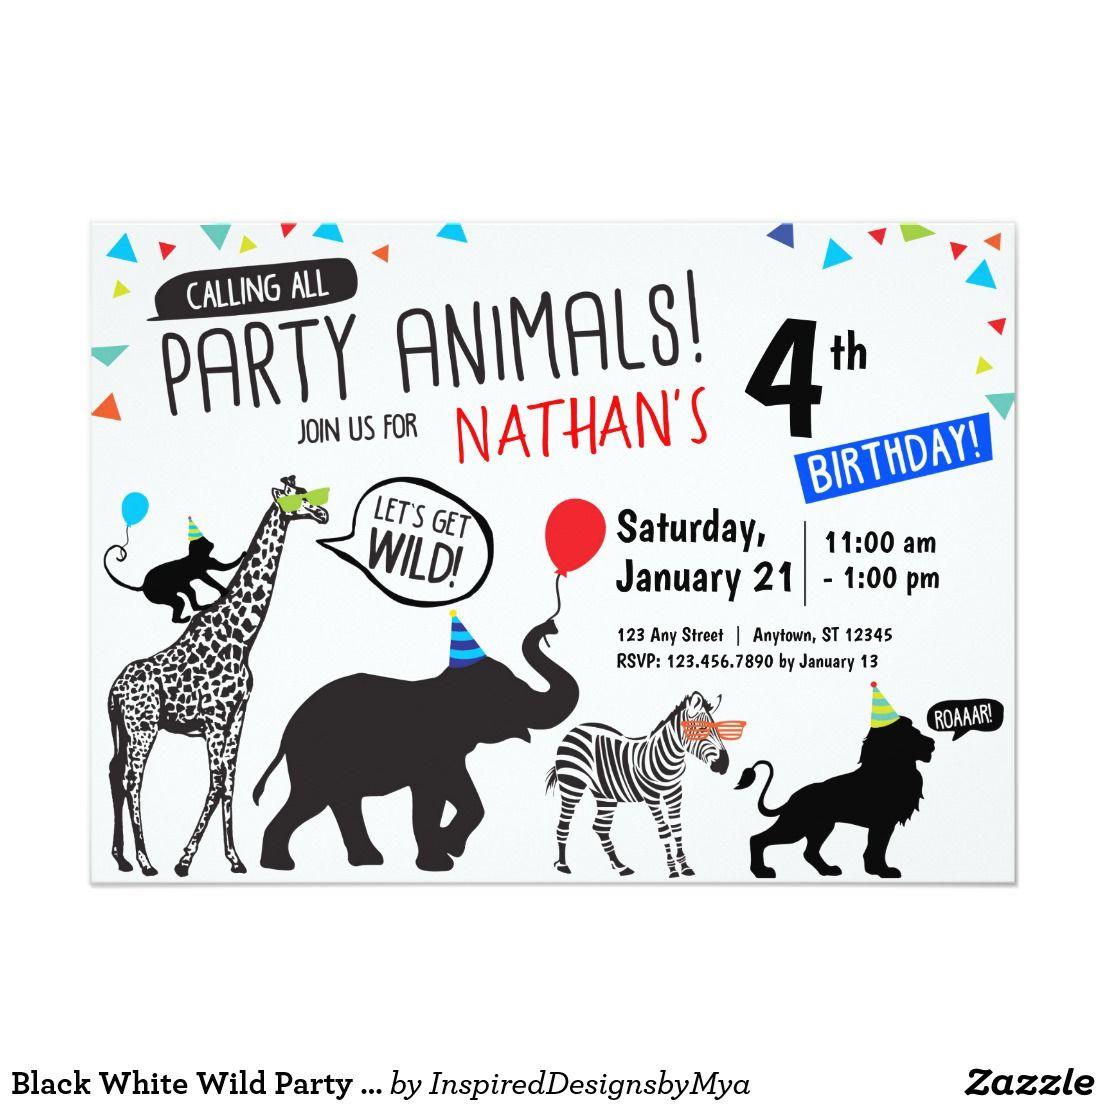 Black White Wild Party Animal Birthday Invitation Zazzle